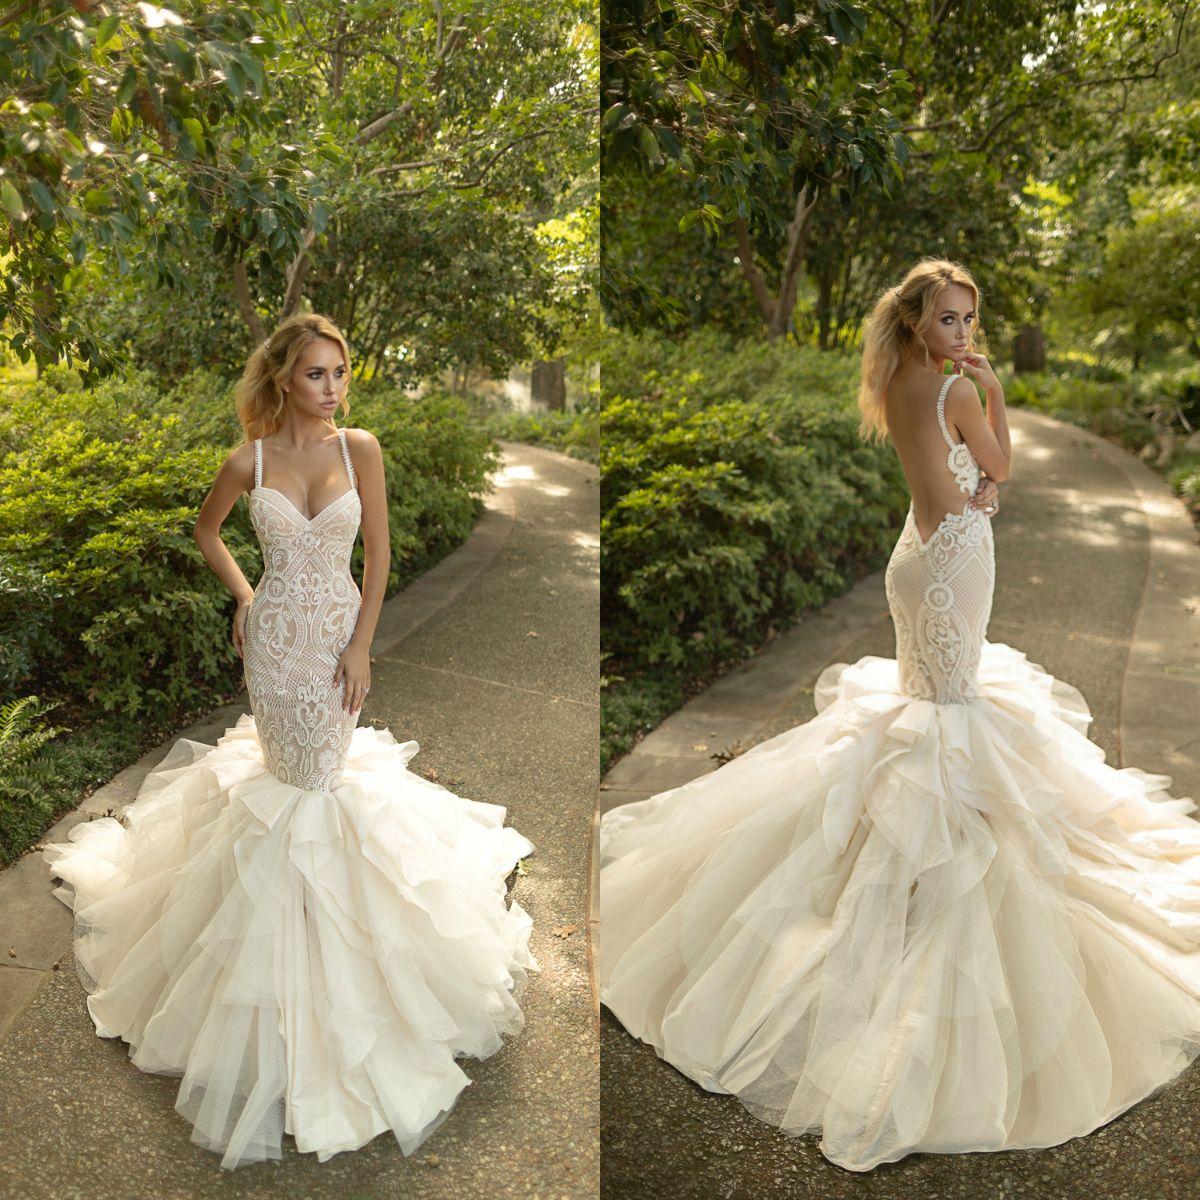 7371435b5b641 Naama   Anat 2019 Mermaid Wedding Dresses Lace Backless Ruffles Fishtail  Bridal Gowns Plus Size Trumpet Vestidos De Noiva Informal Wedding Dress  Long Sleeve ...